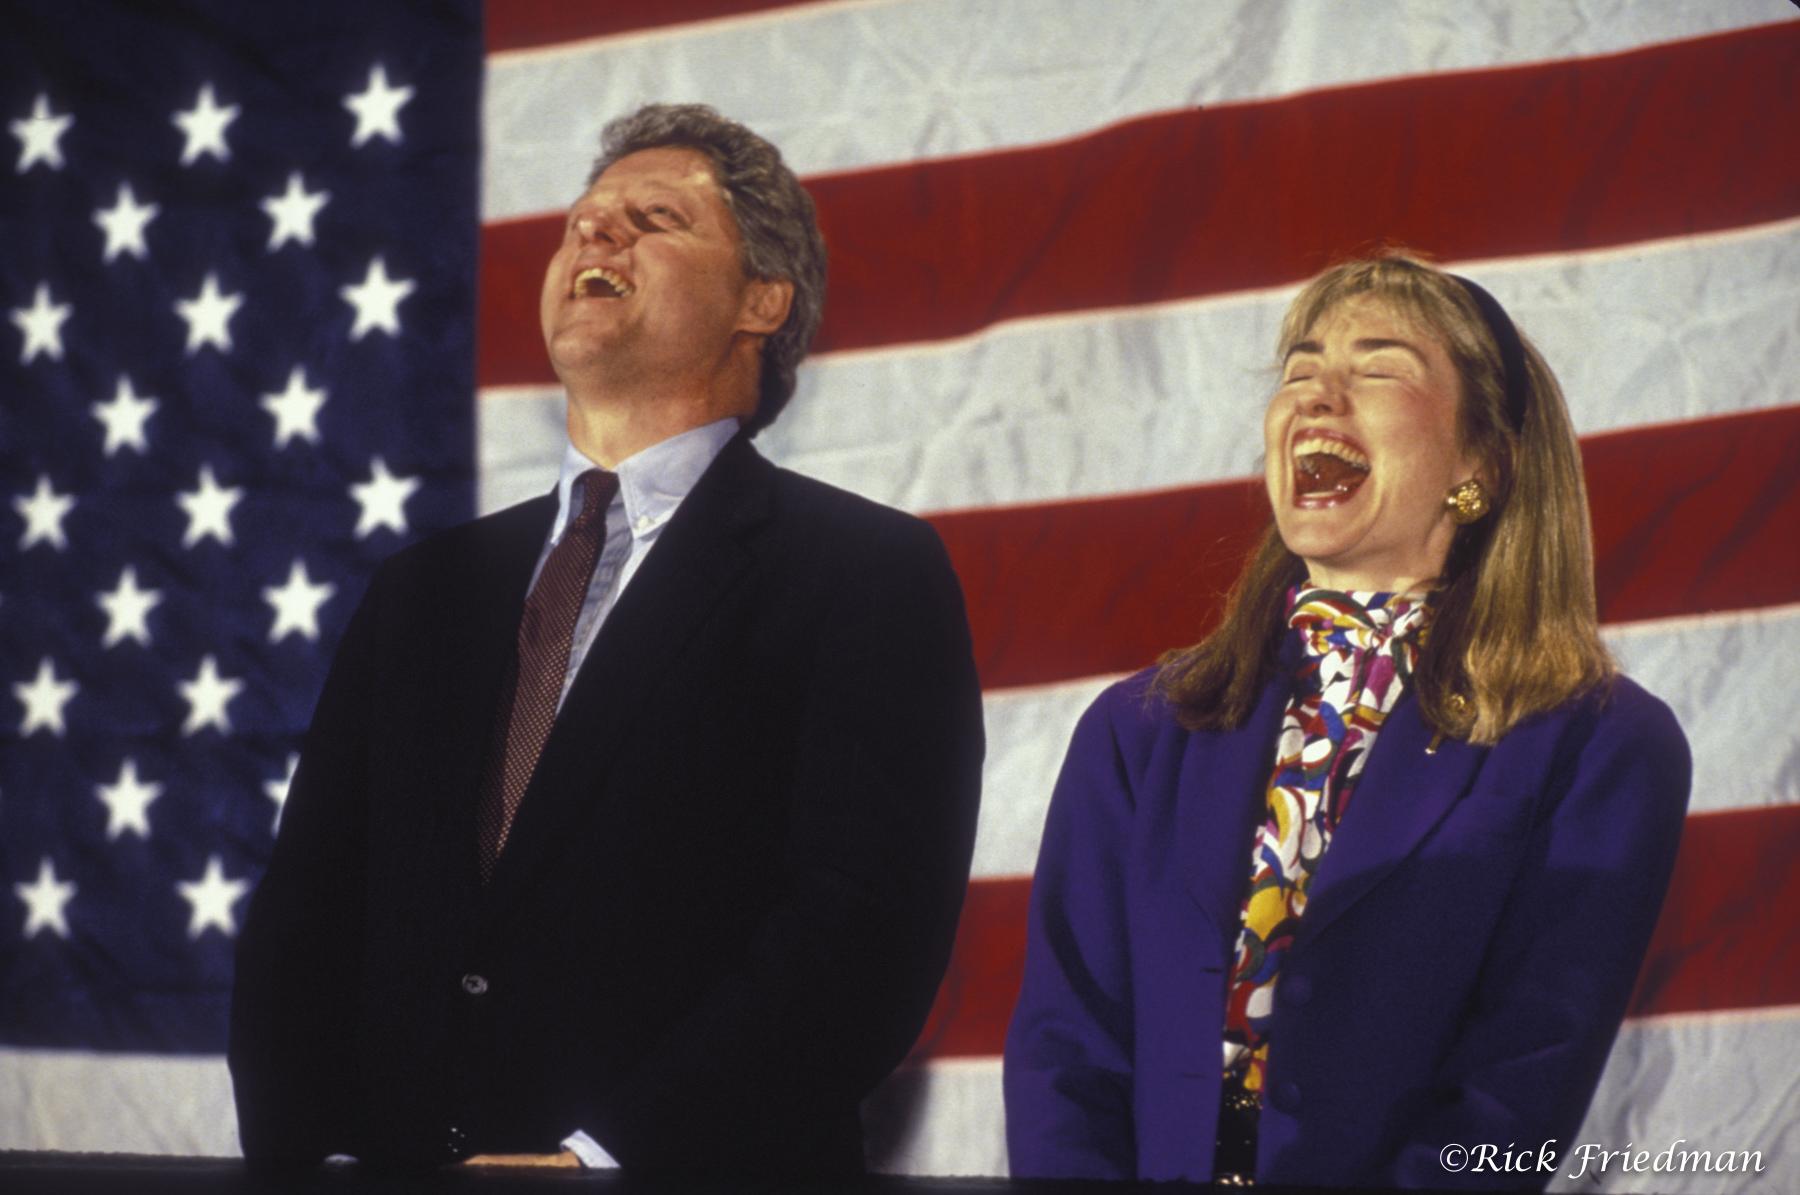 Laughing Clintonsa copyCMYK.jpg